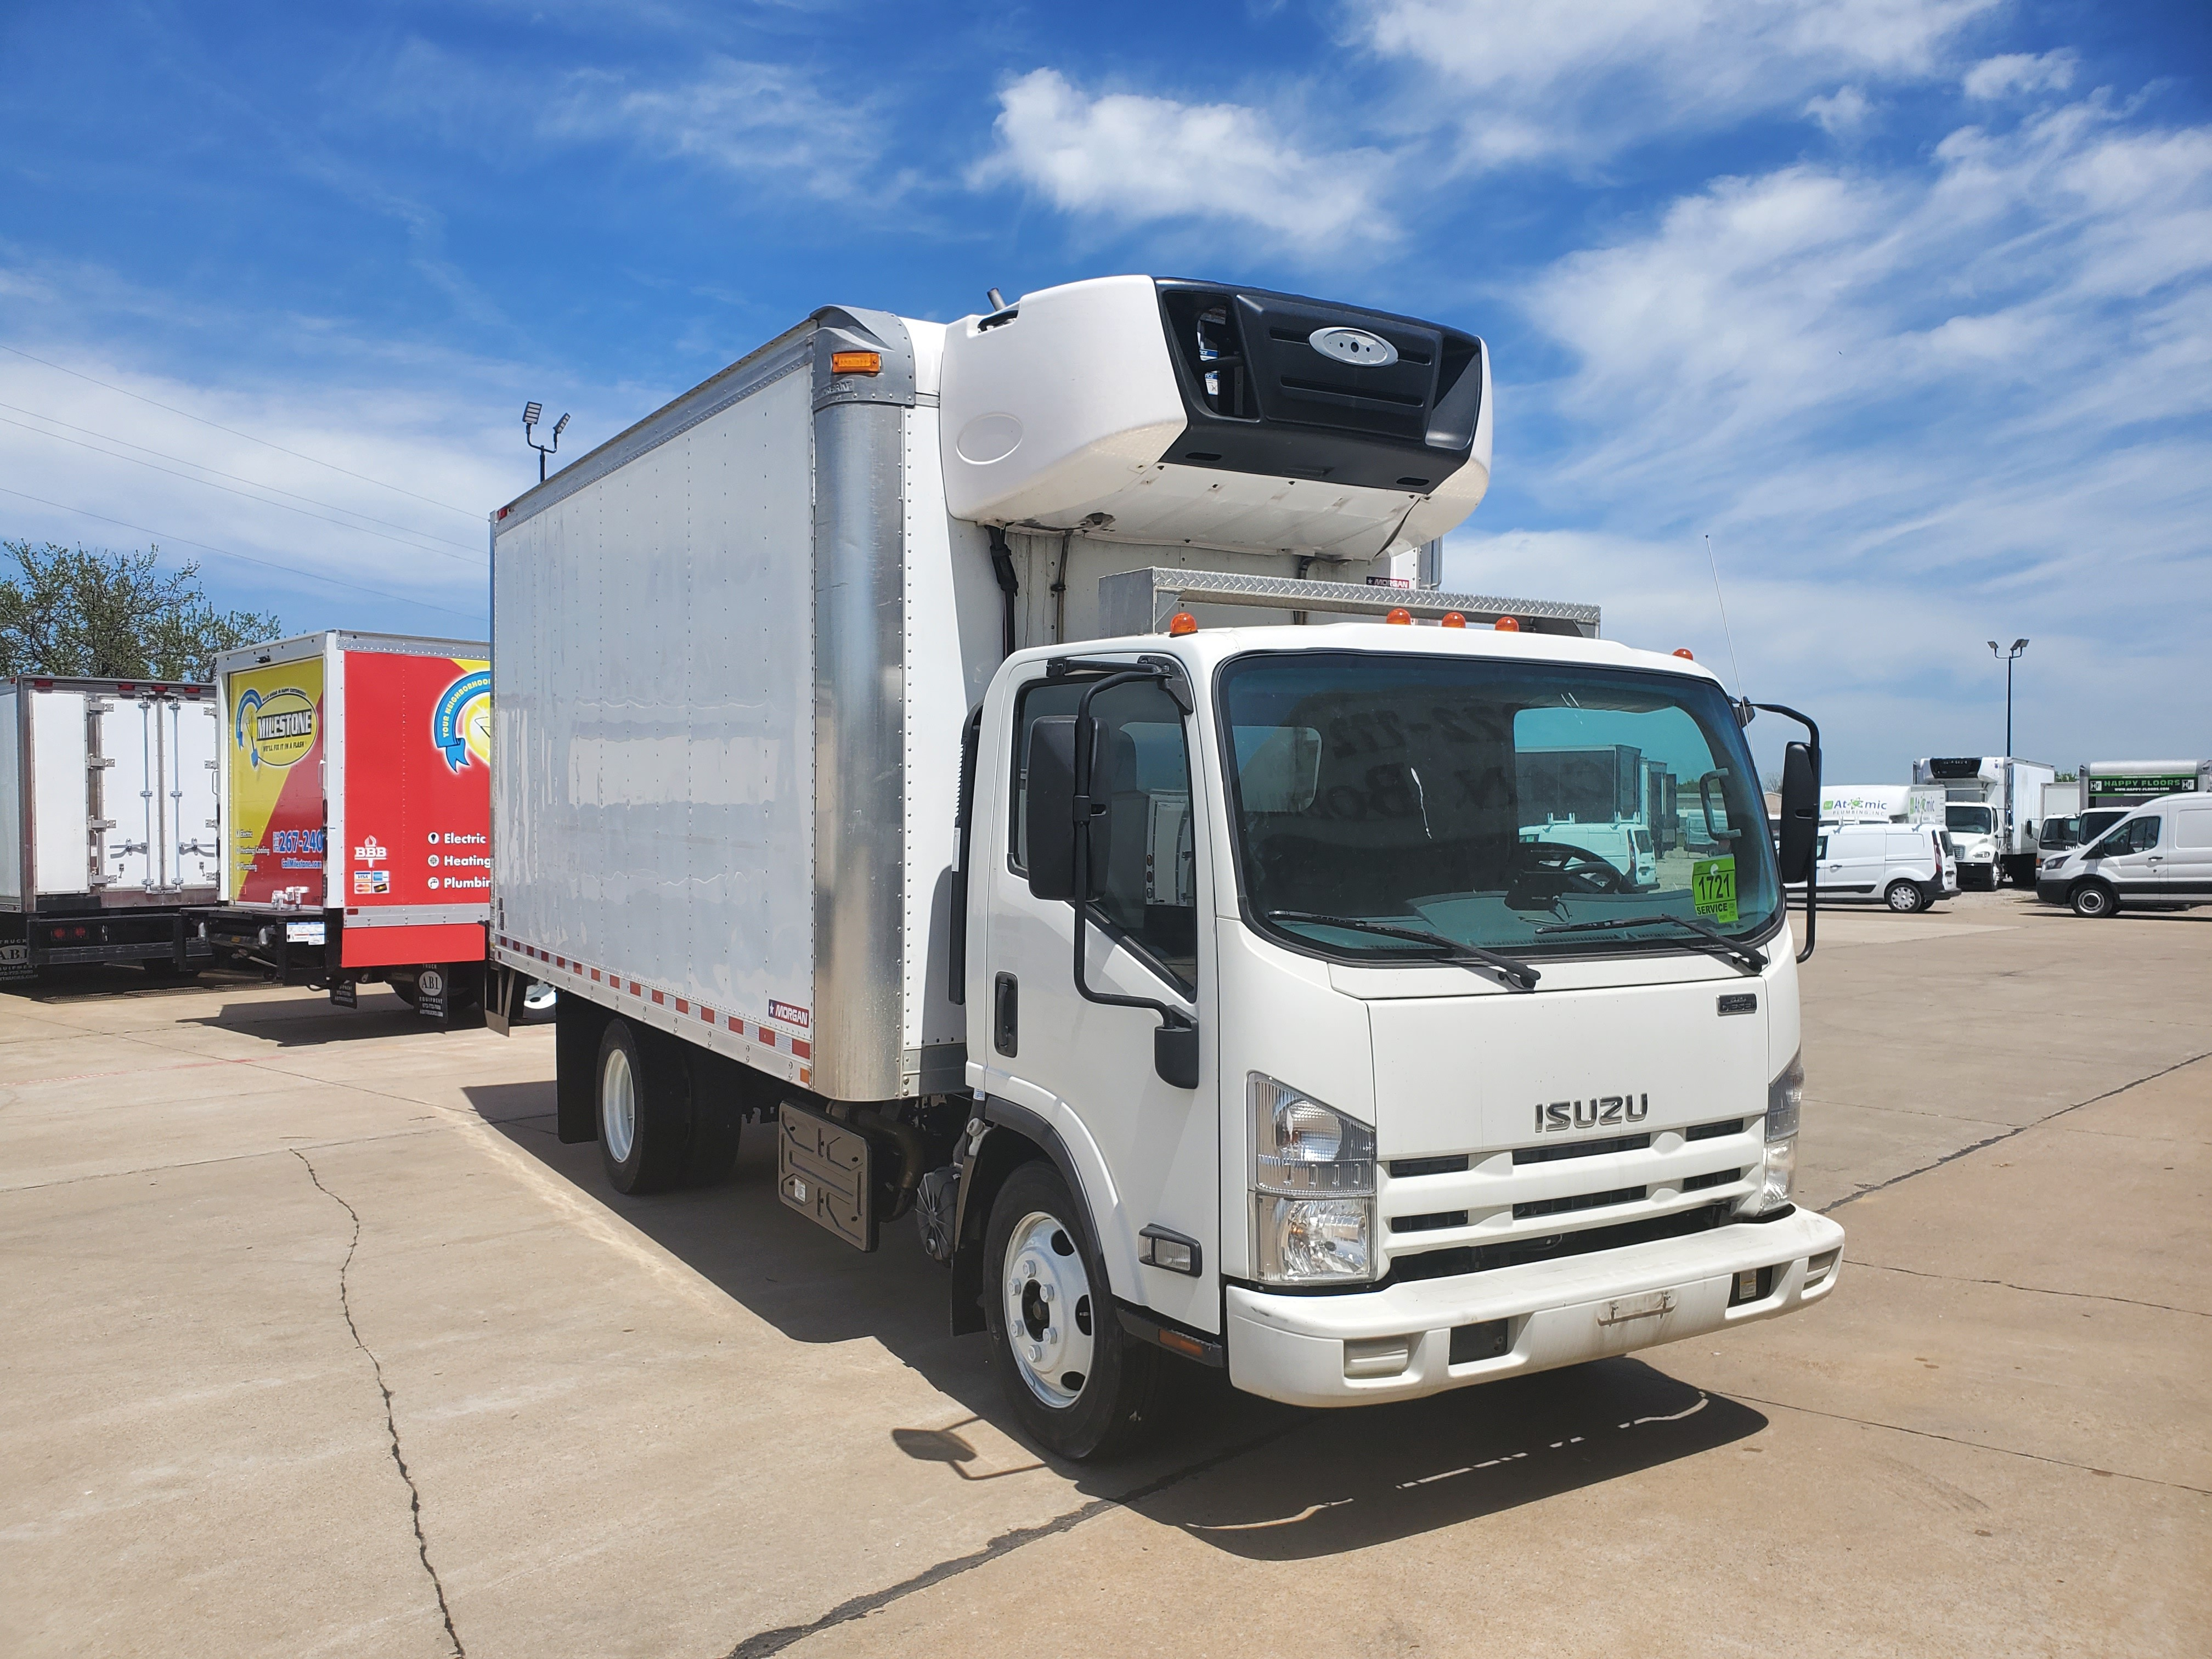 Used, 2015, Isuzu, NPR-XD, Cab / Chassis Trucks